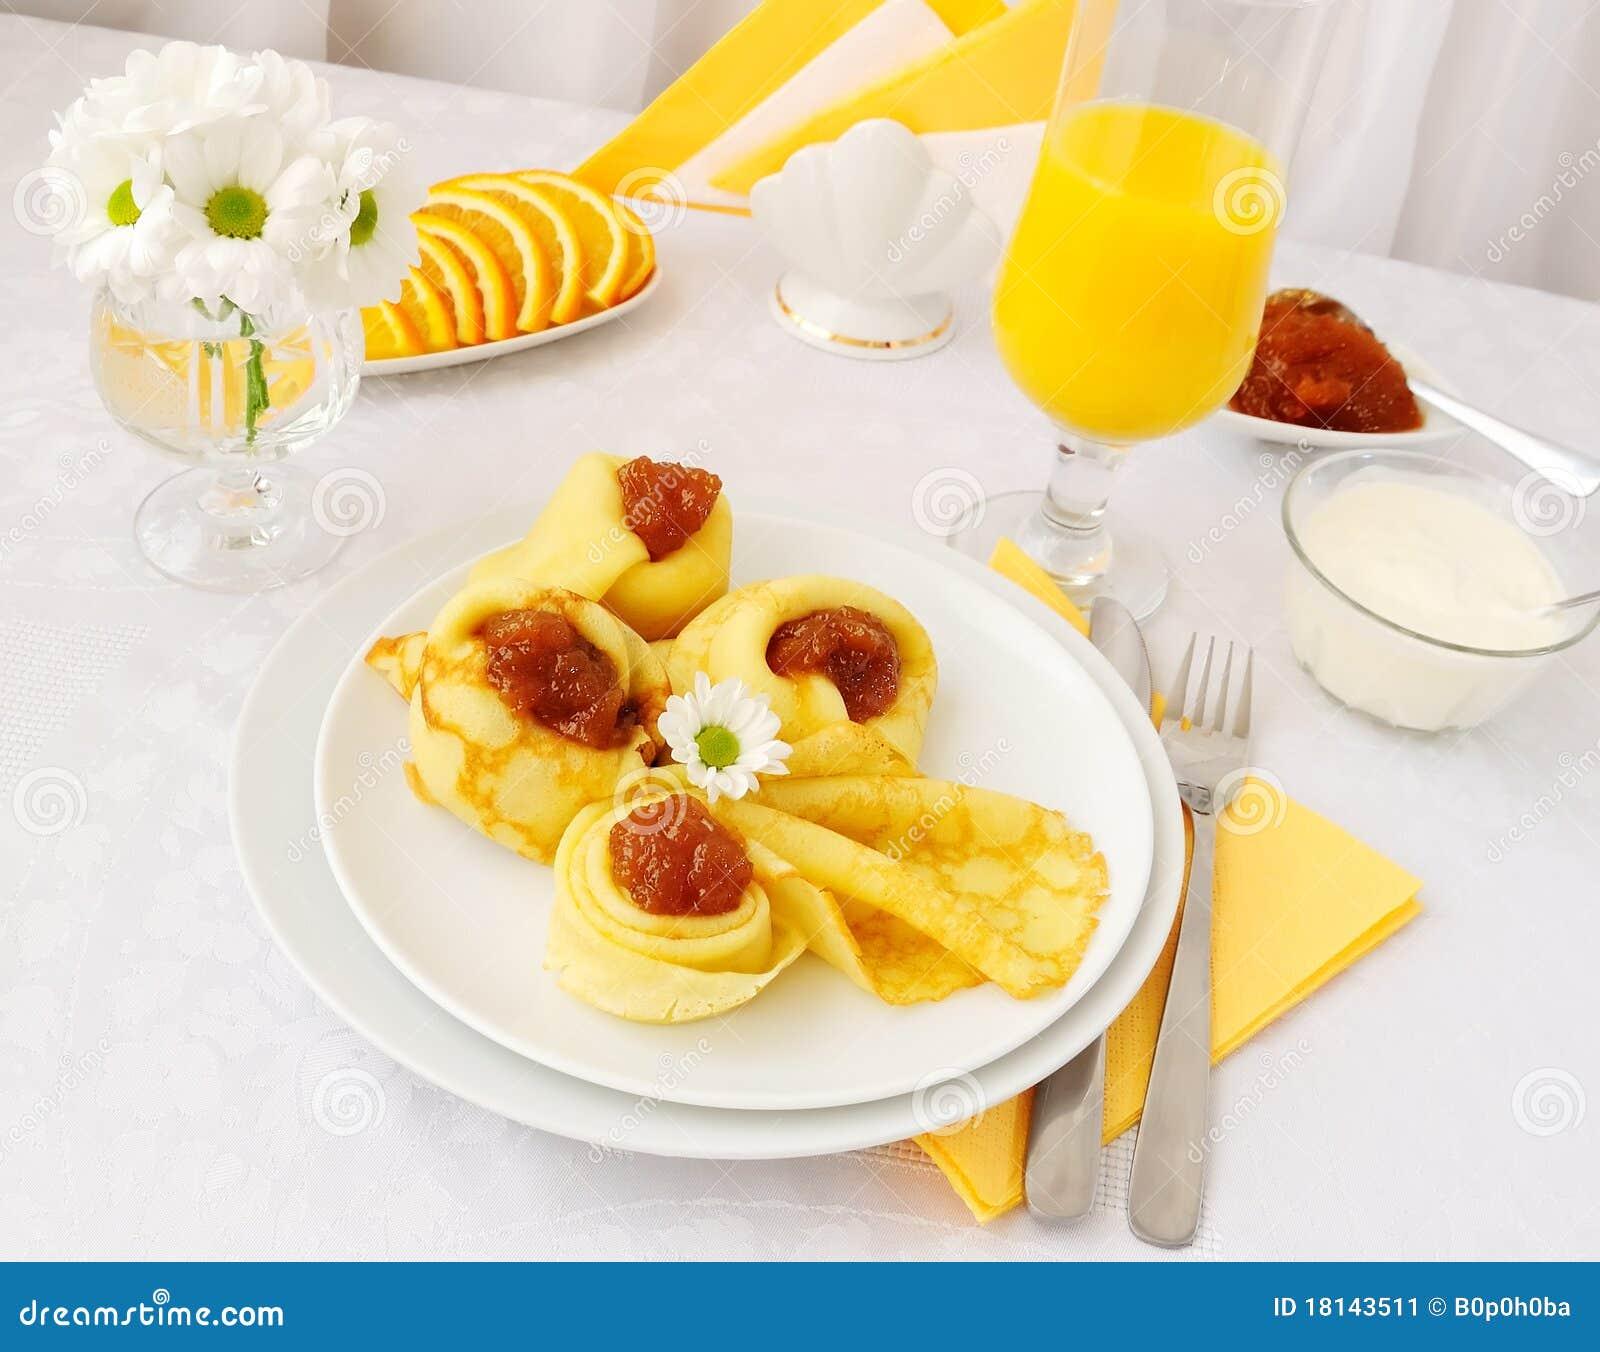 Download Pancakes with jam stock image. Image of juice, food, vitamins - 18143511